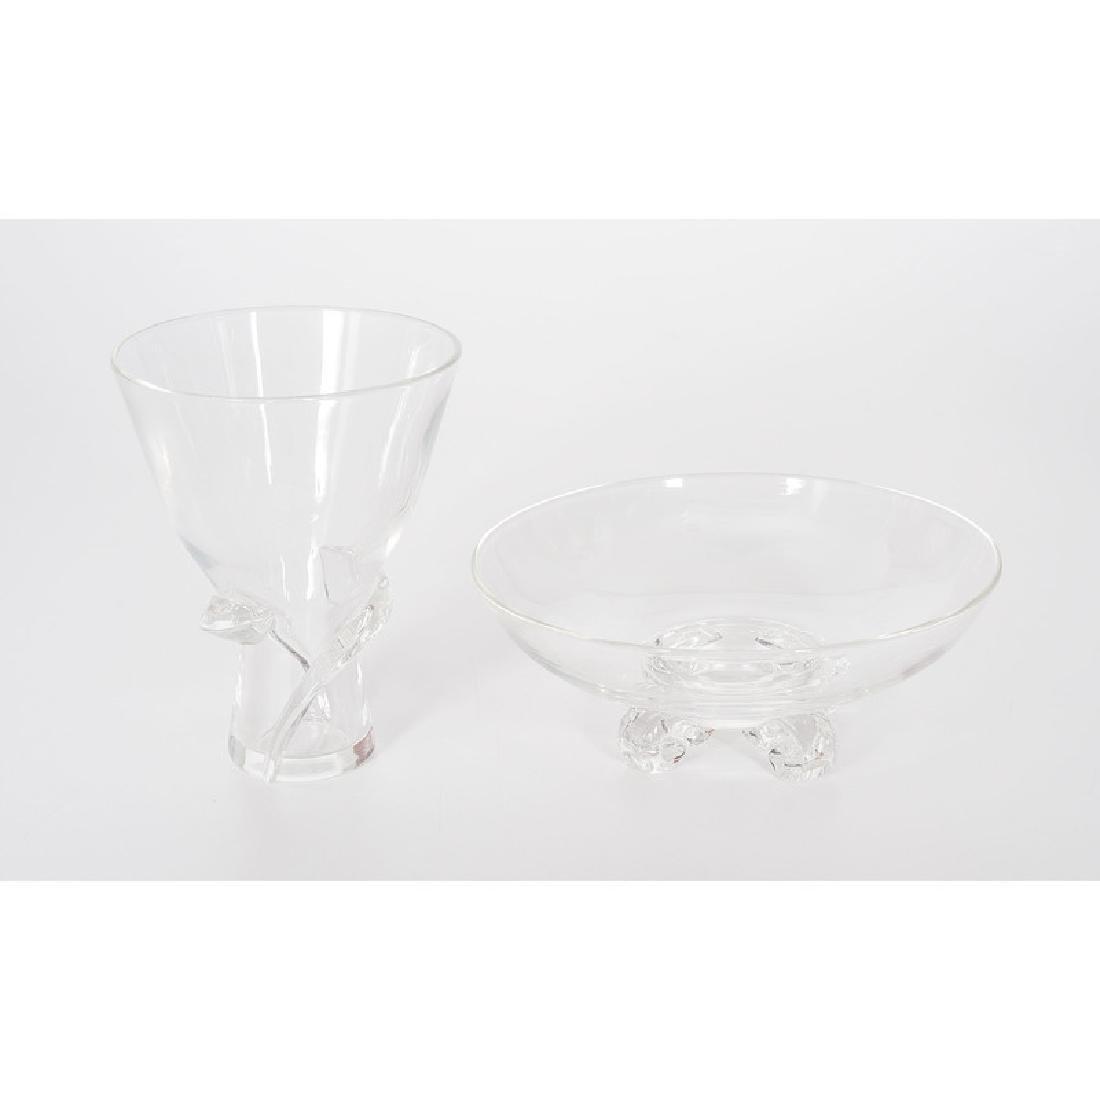 Steuben Crystal Vase and Bowl - 2